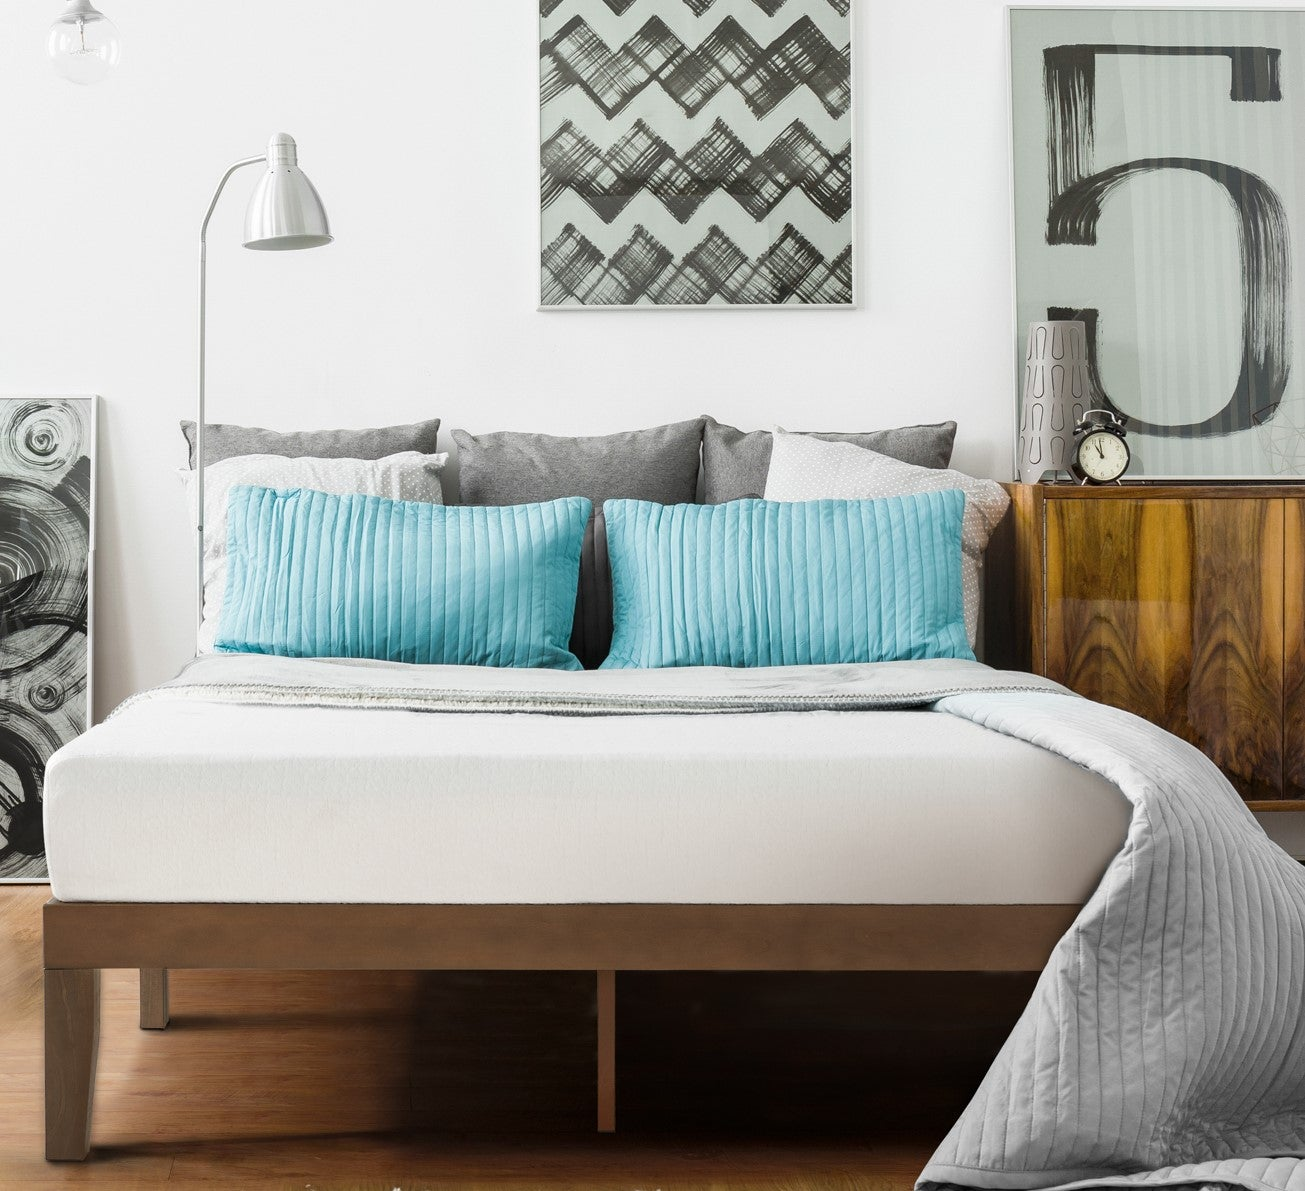 Zinus Blake Solid Wood Walnut Bed Frame